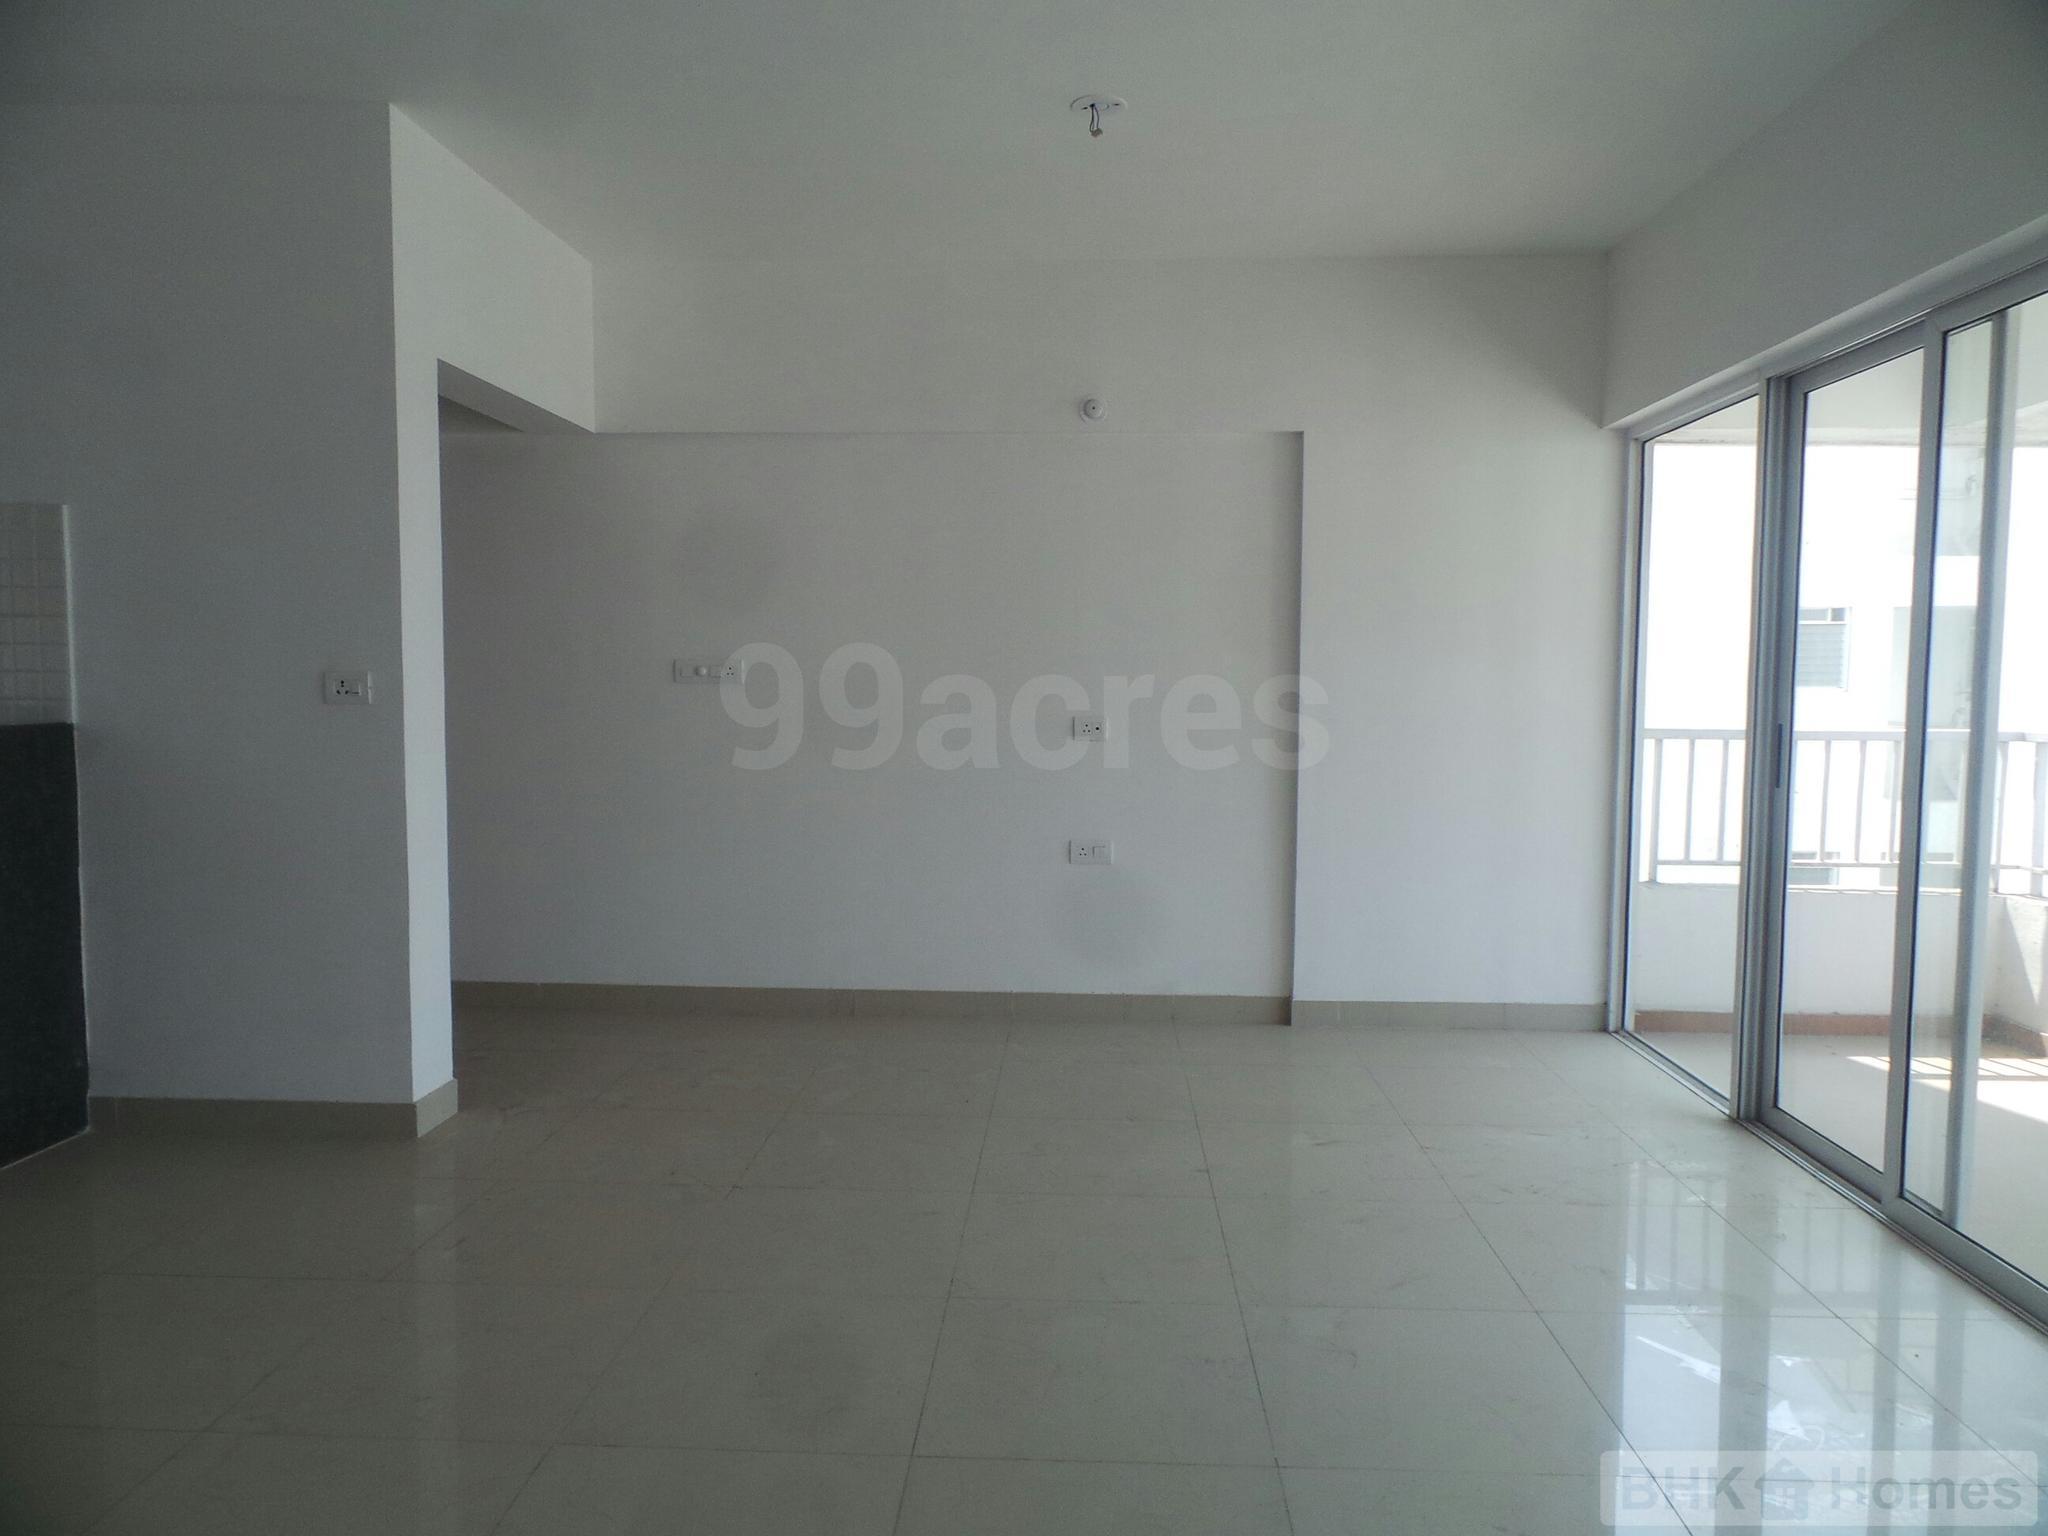 2 BHK Apartment for Sale in hingne Khurd